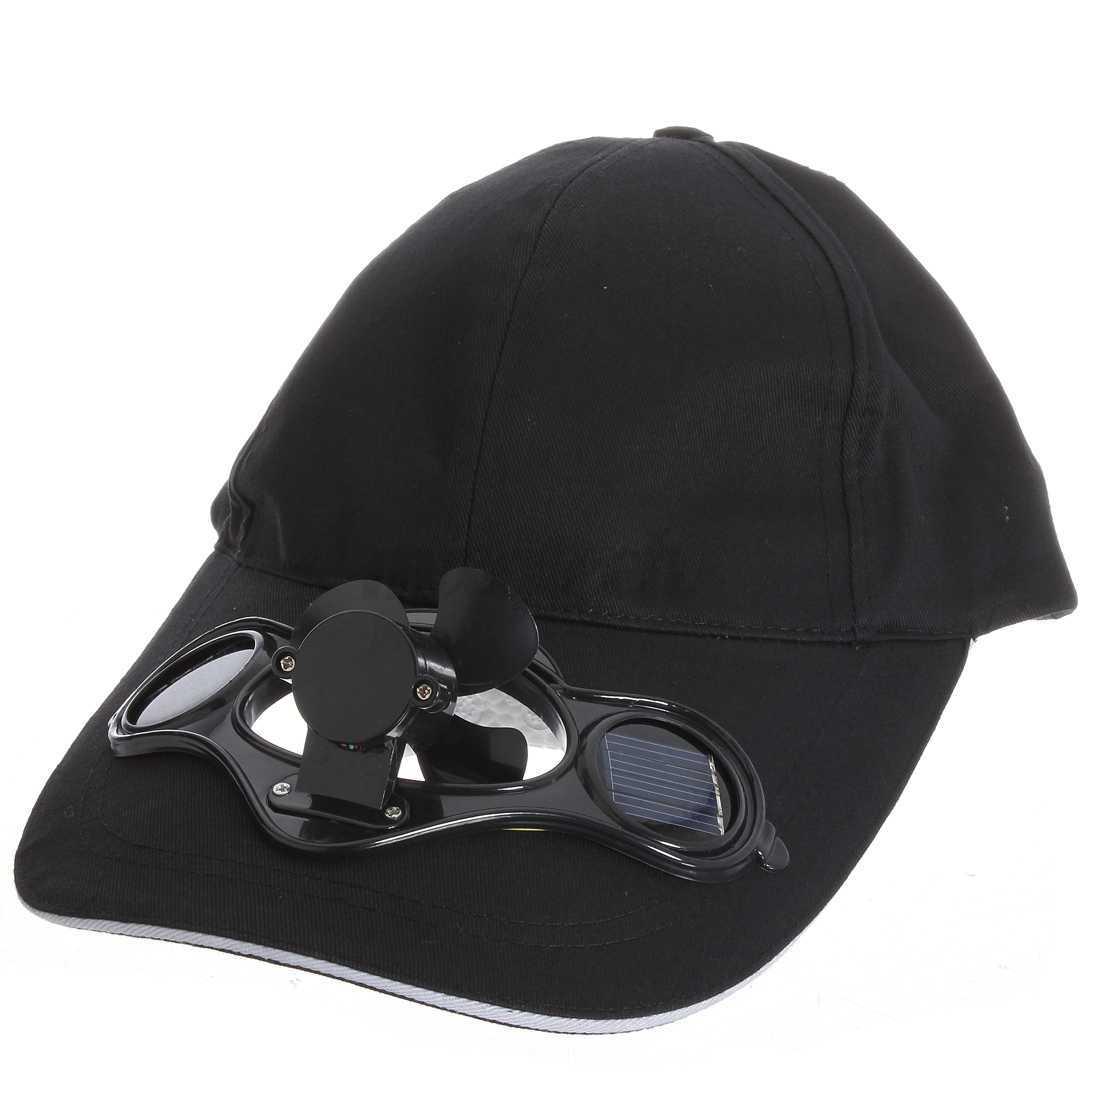 Summer Sports Outdoor Hat Cap Solar Sun Power Cool Fan For